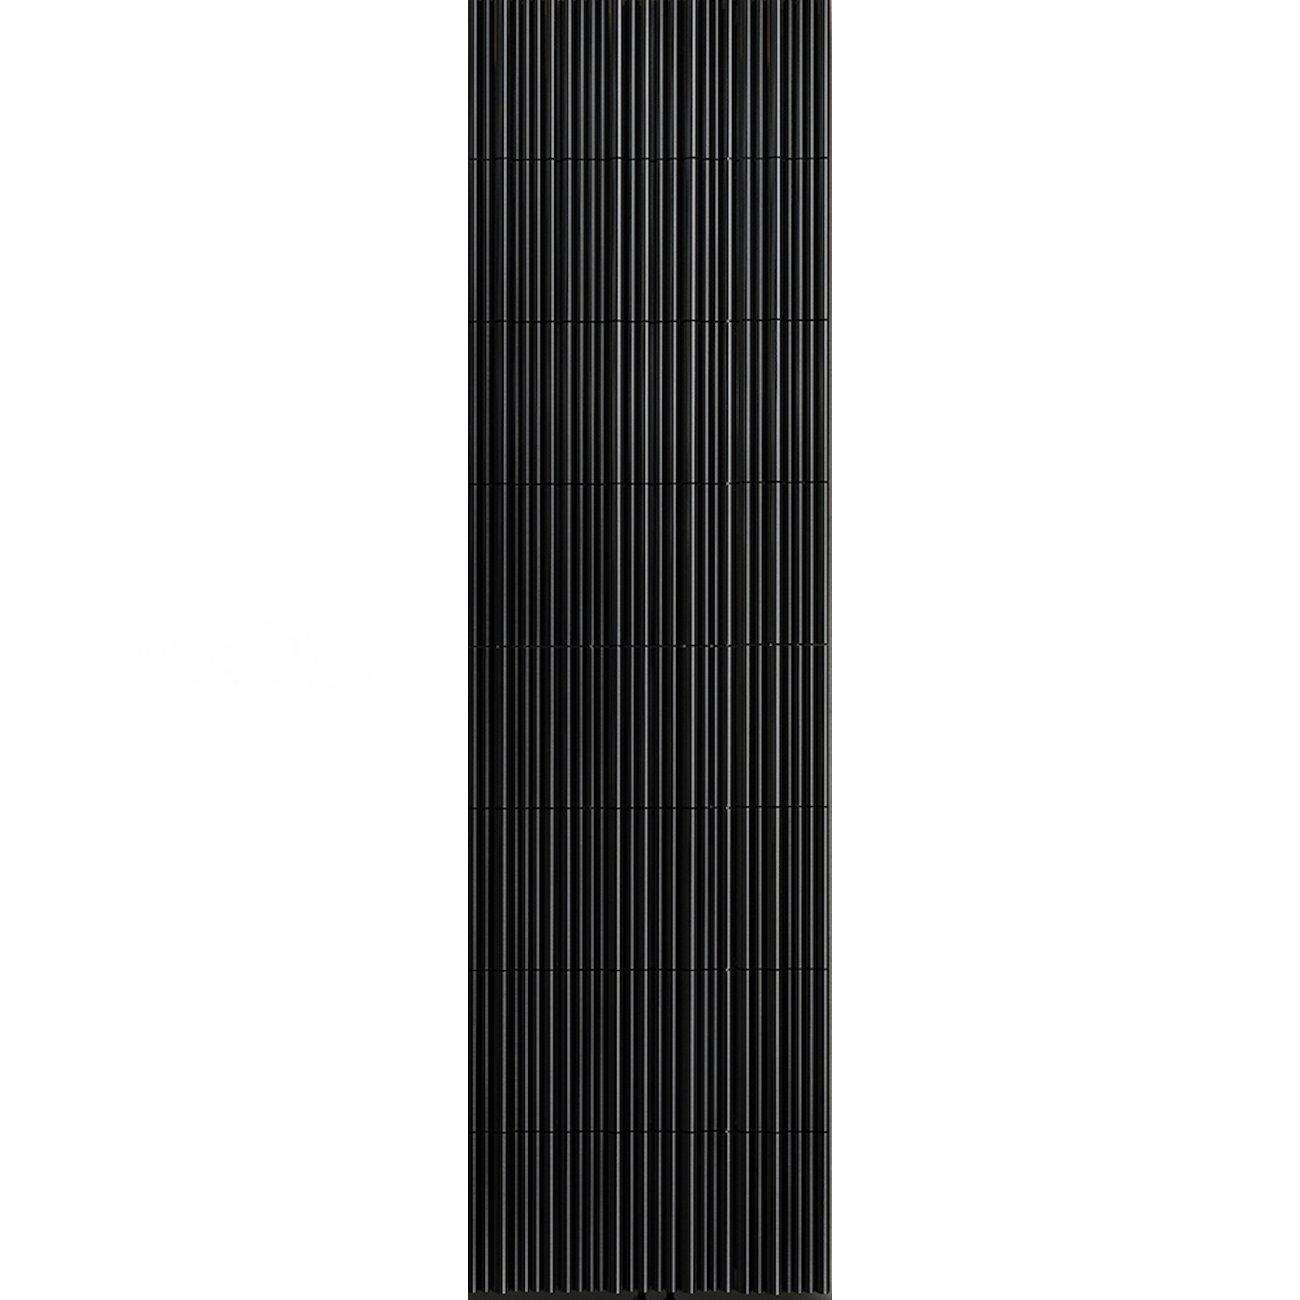 k8 radiatori bamboo wand heizk rper. Black Bedroom Furniture Sets. Home Design Ideas